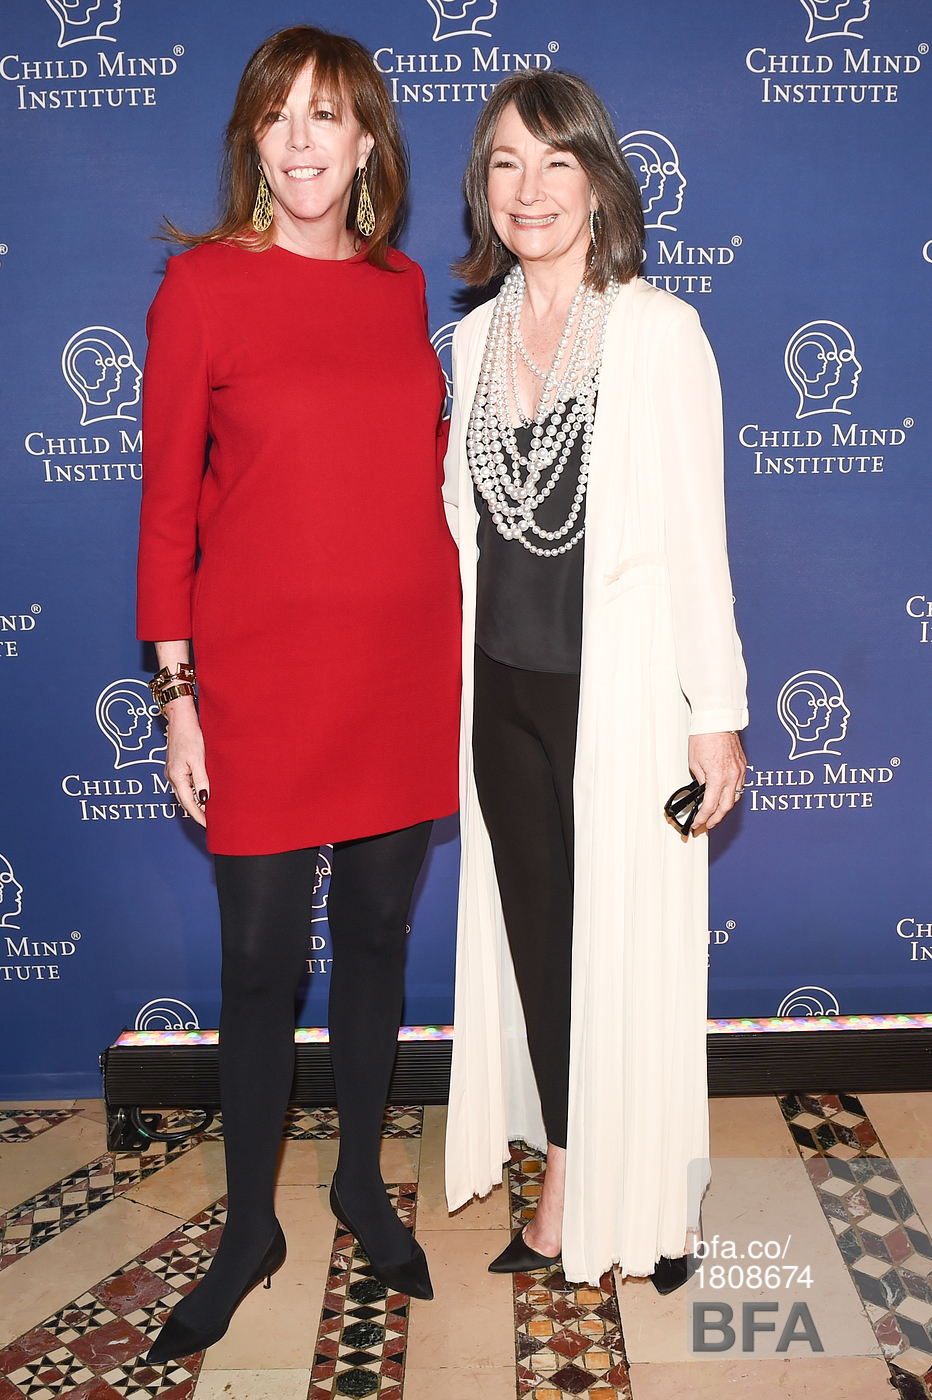 Jane Rosenthal & Brooke Garber Neidich - December 2015 - Christy Rilling Studio shift dress & camisole